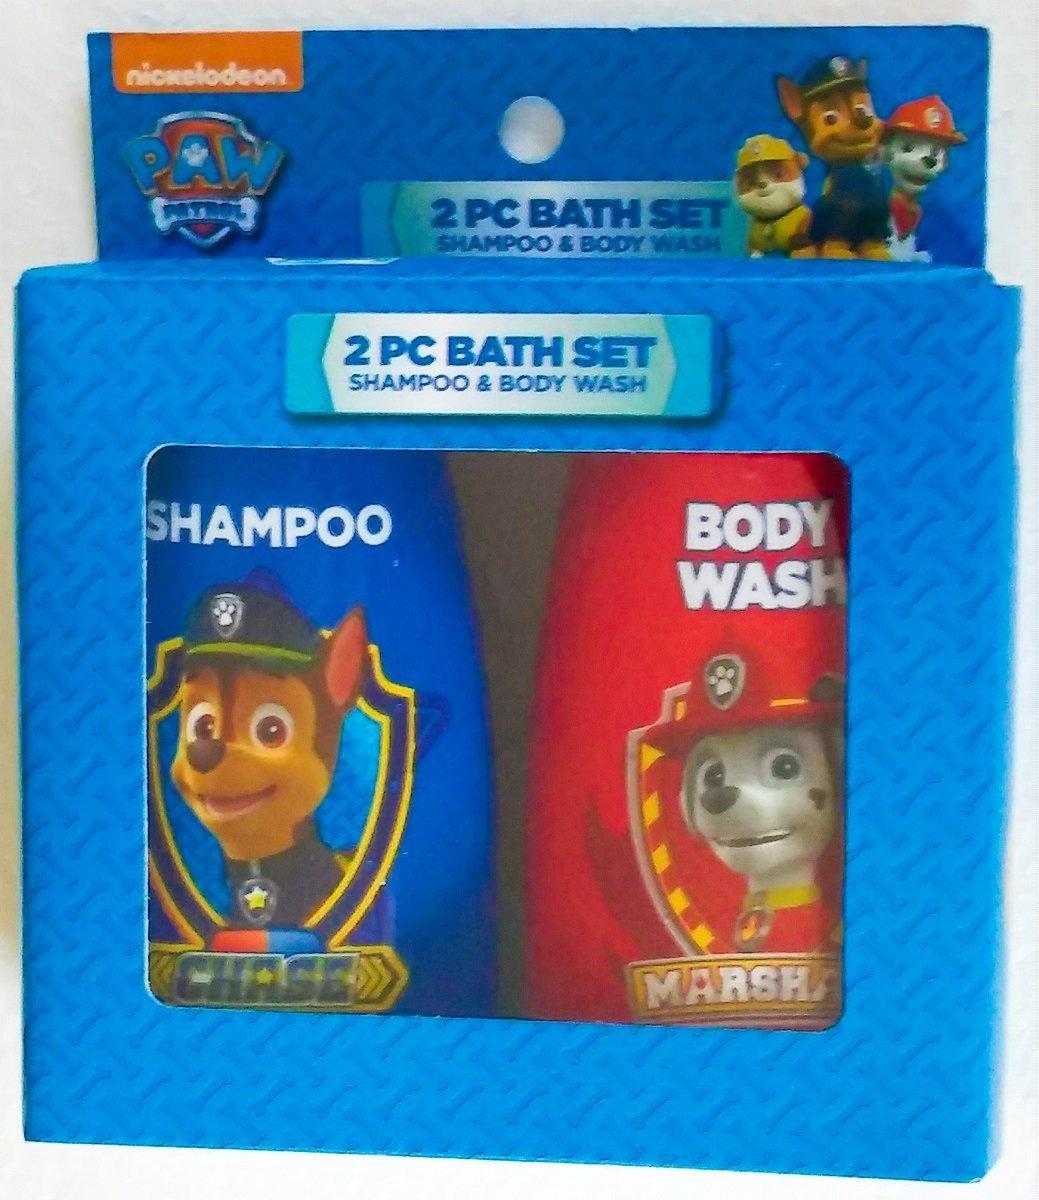 Paw Patrol 2 Piece Bath Set - Shampoo and Body Wash - Chase Marshall